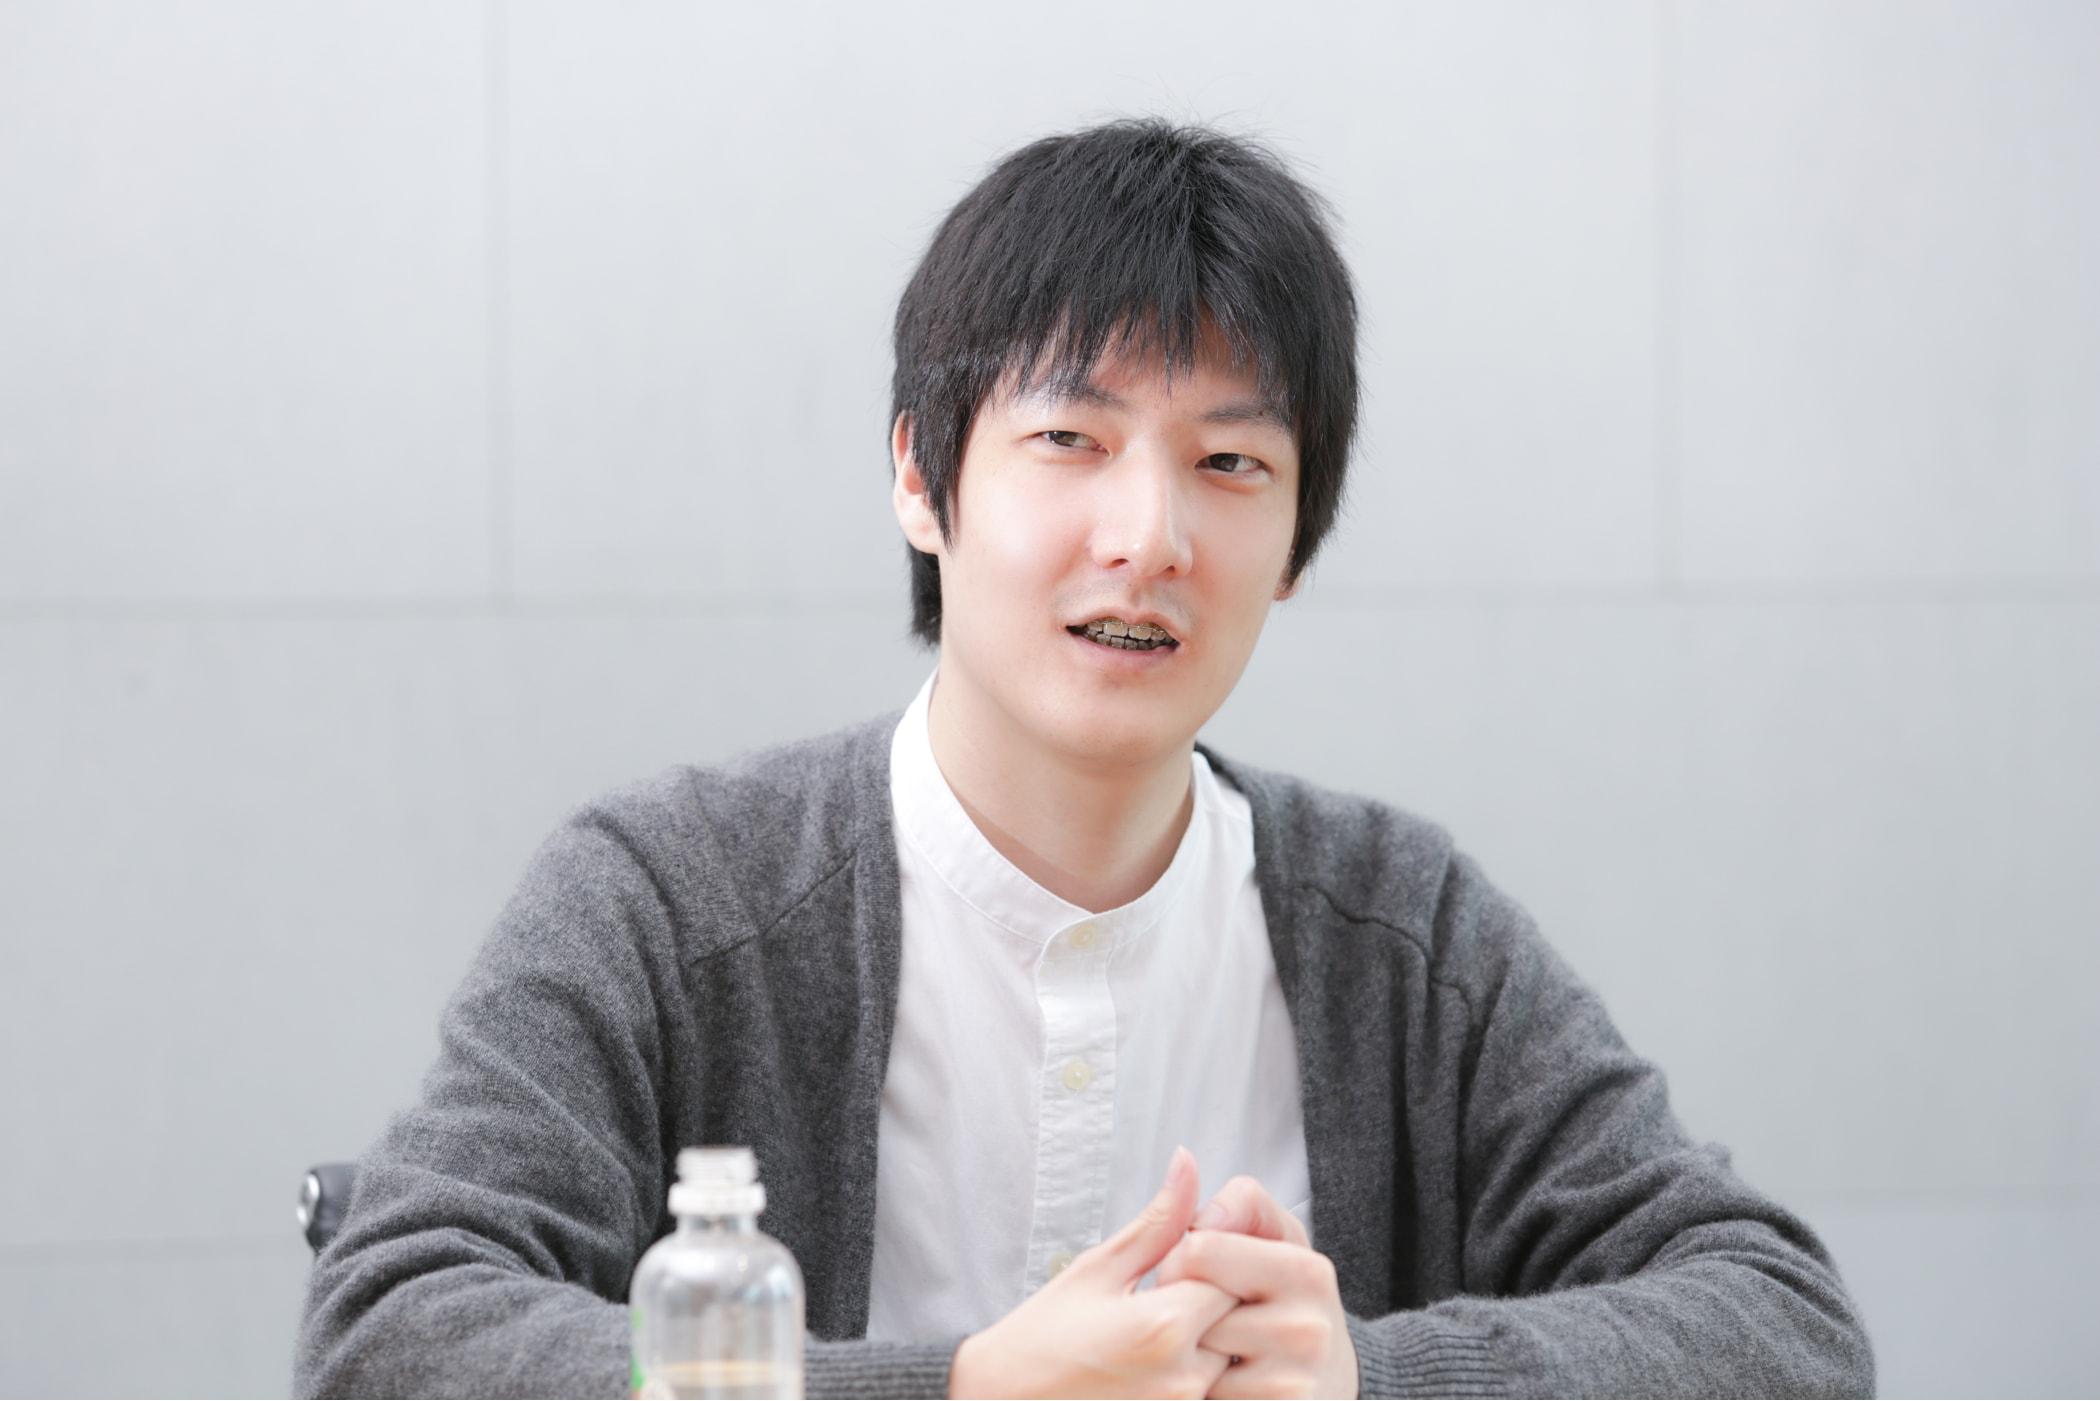 Daiki Ishimori, CEO of Gehirn Inc.